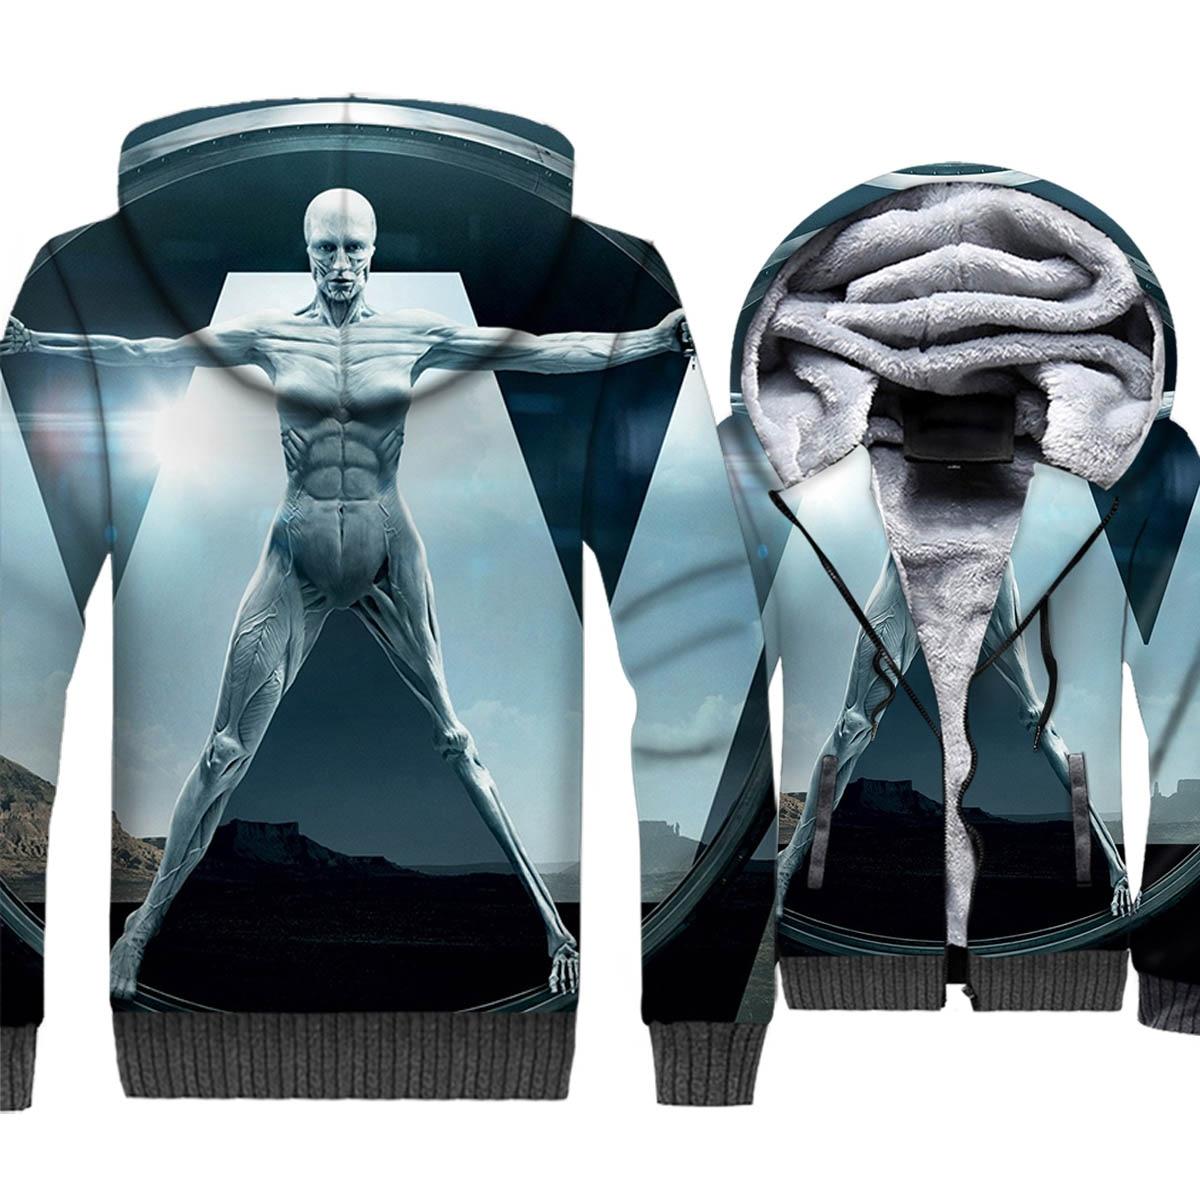 2019 new hot TV series Westworld jackets coats winter casual wool liner zipper hoodies sportswear harajuku plus tracksuits M 5XL